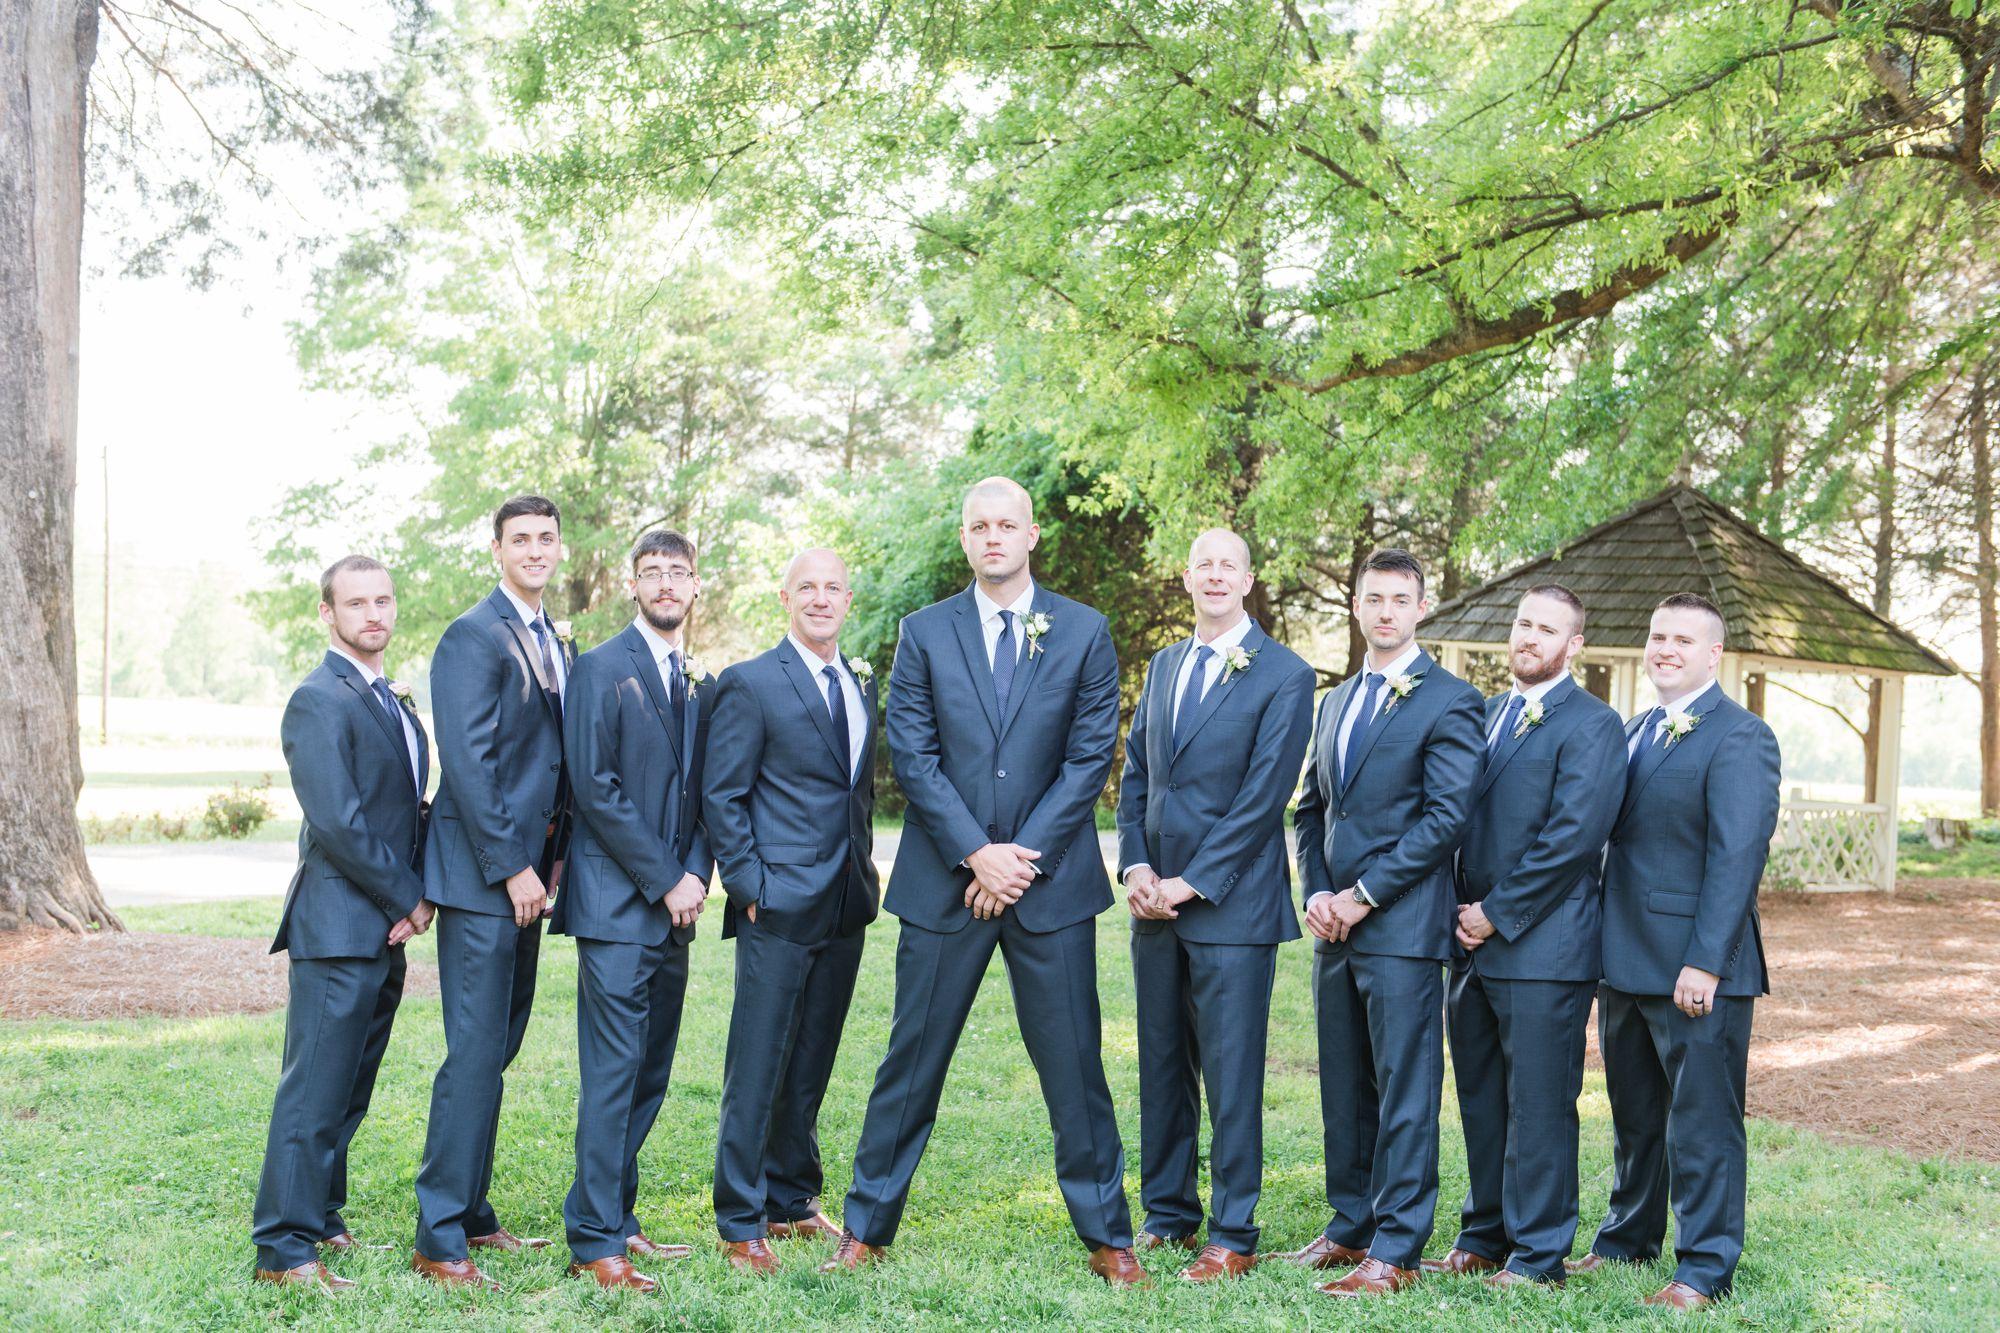 beaver-dam-house-davidson-nc-wedding-photos 32